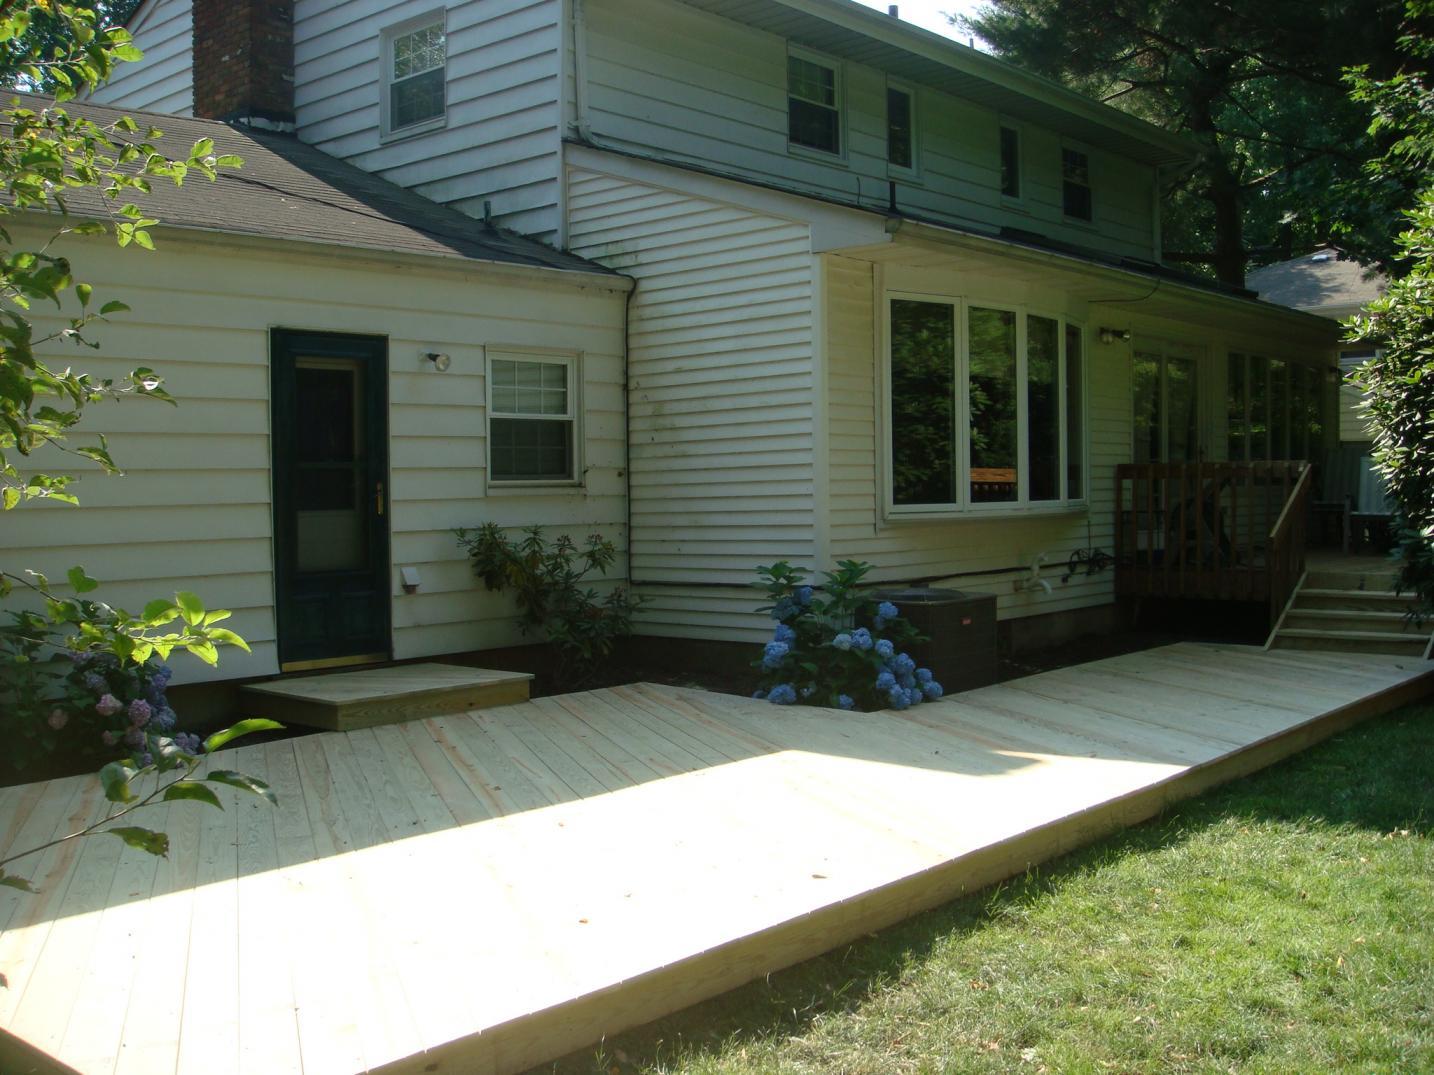 First Ground Level Deck...need Advice Please!! - Decks ... on Ground Level Patio Ideas id=63489